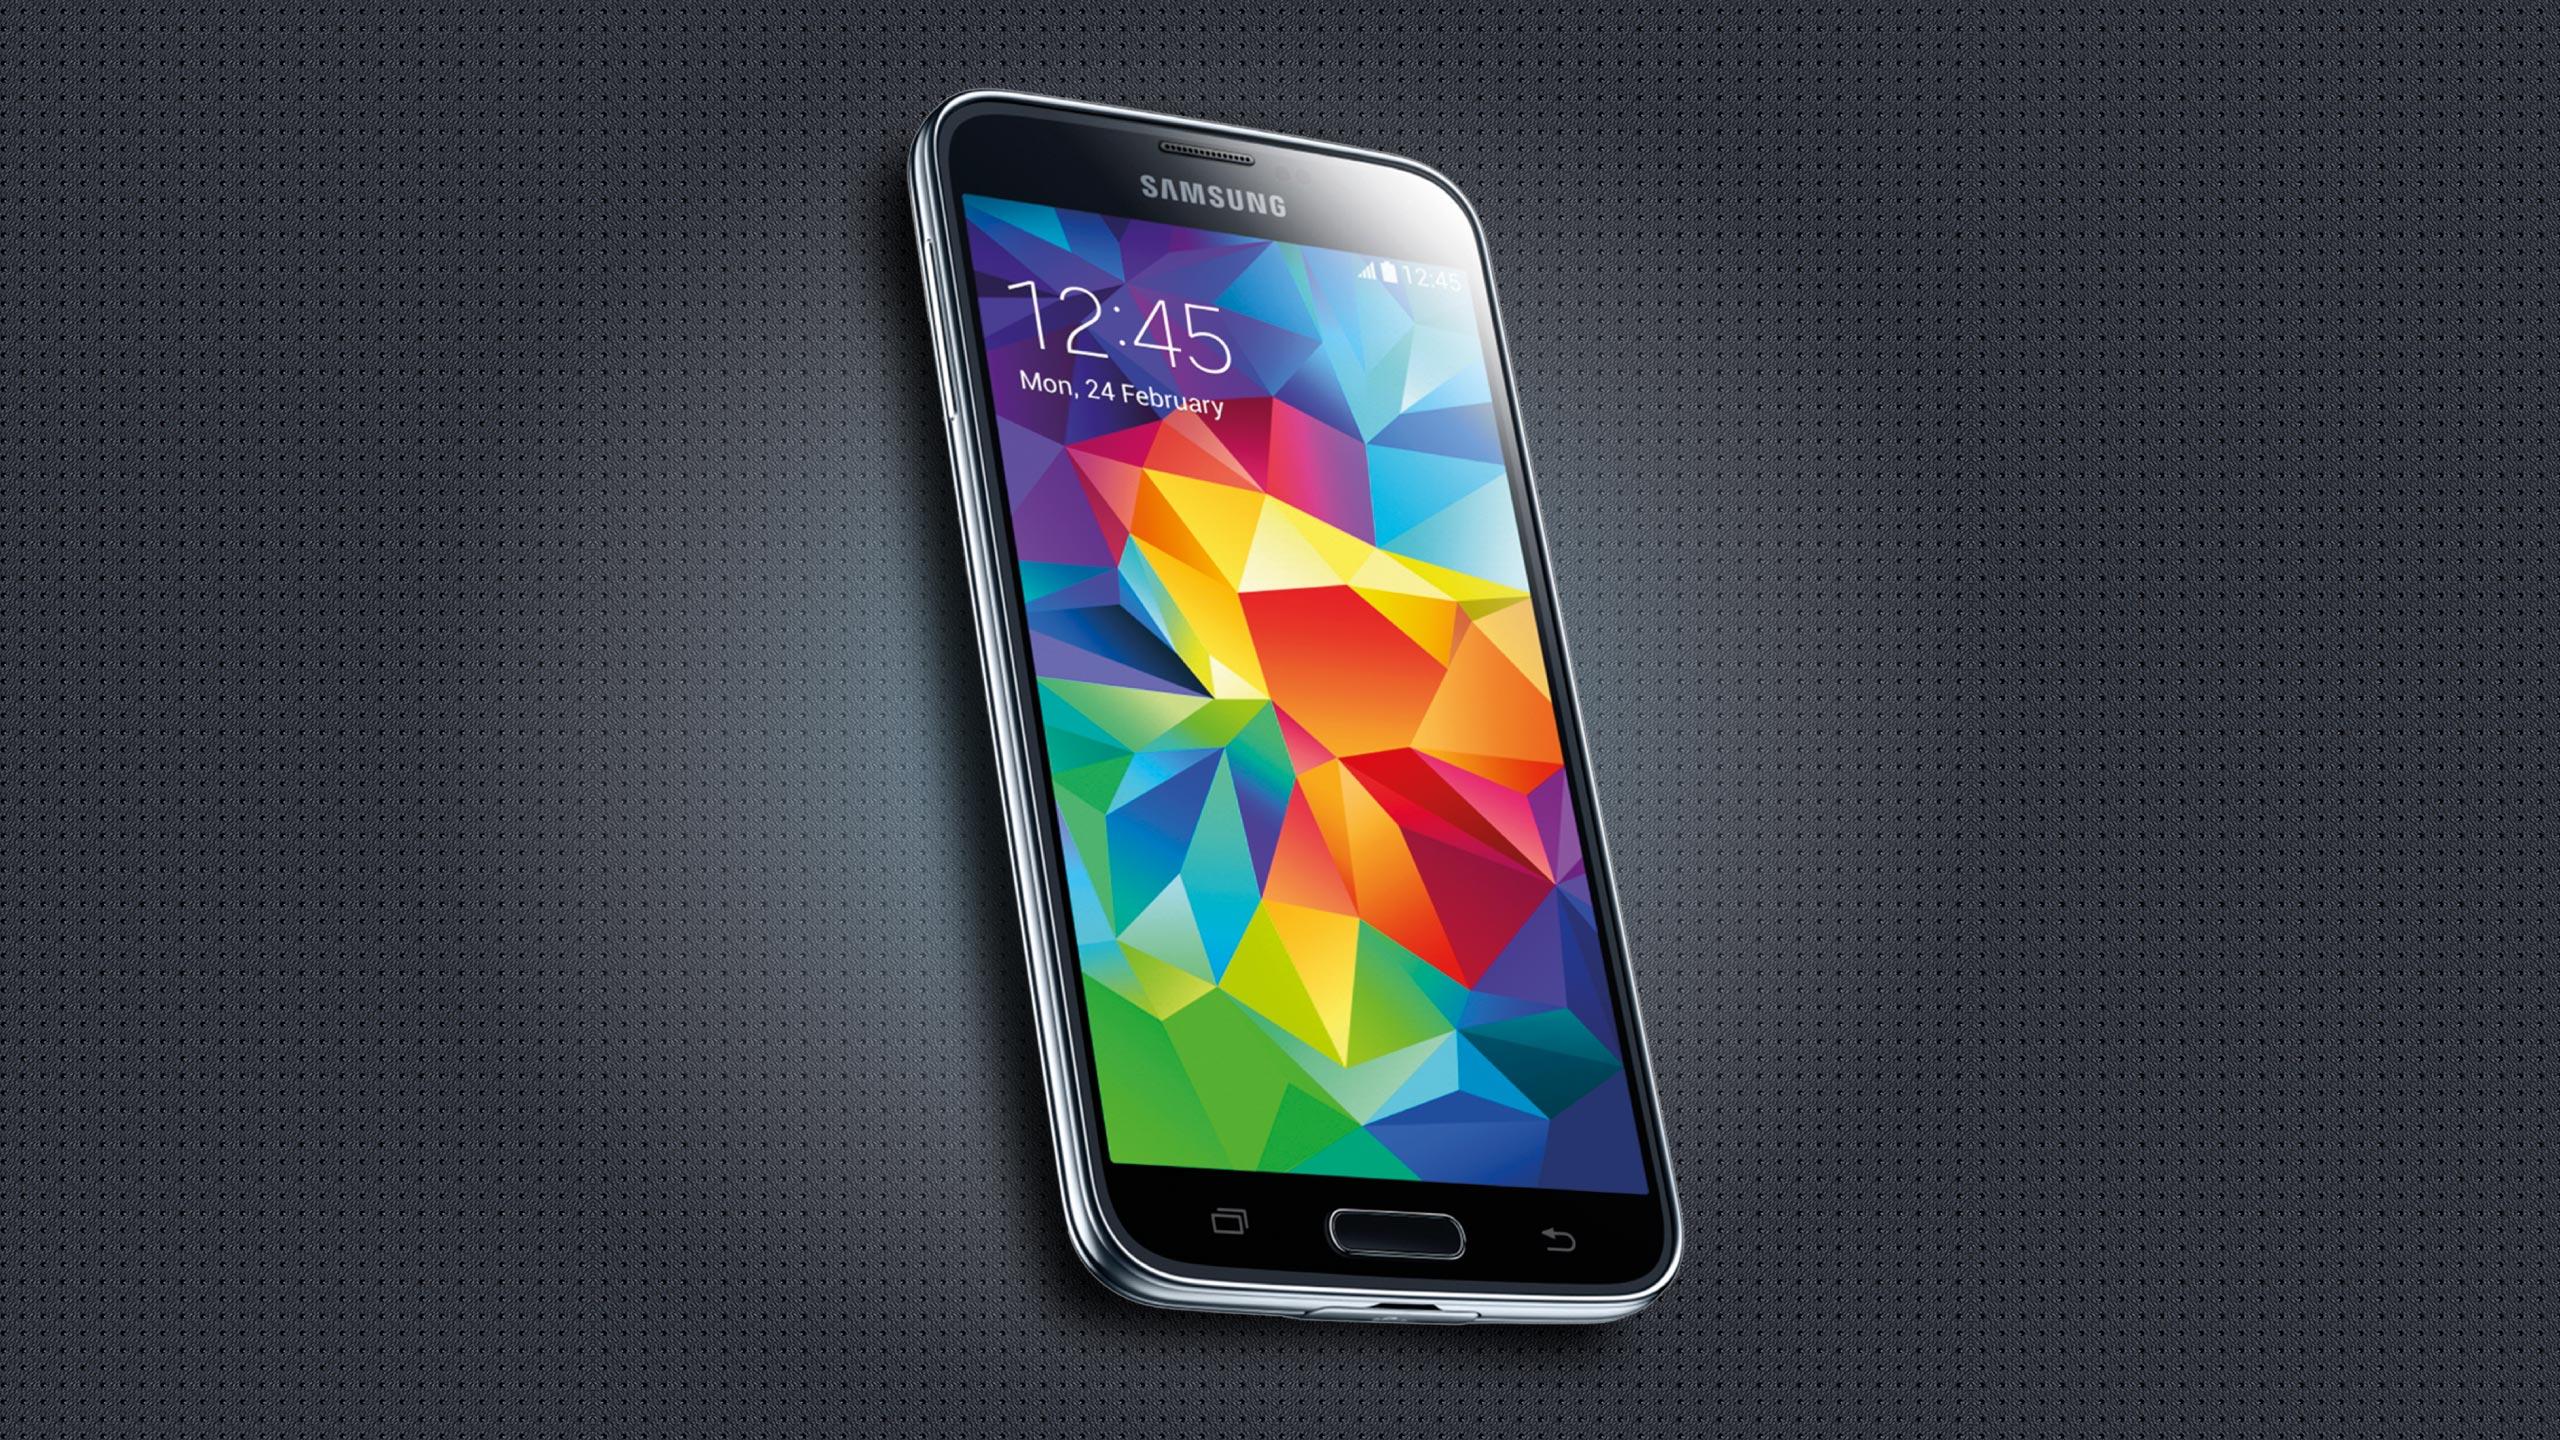 Samsung S5 | m:tel | Agencija AQUARIUS | Banja Luka